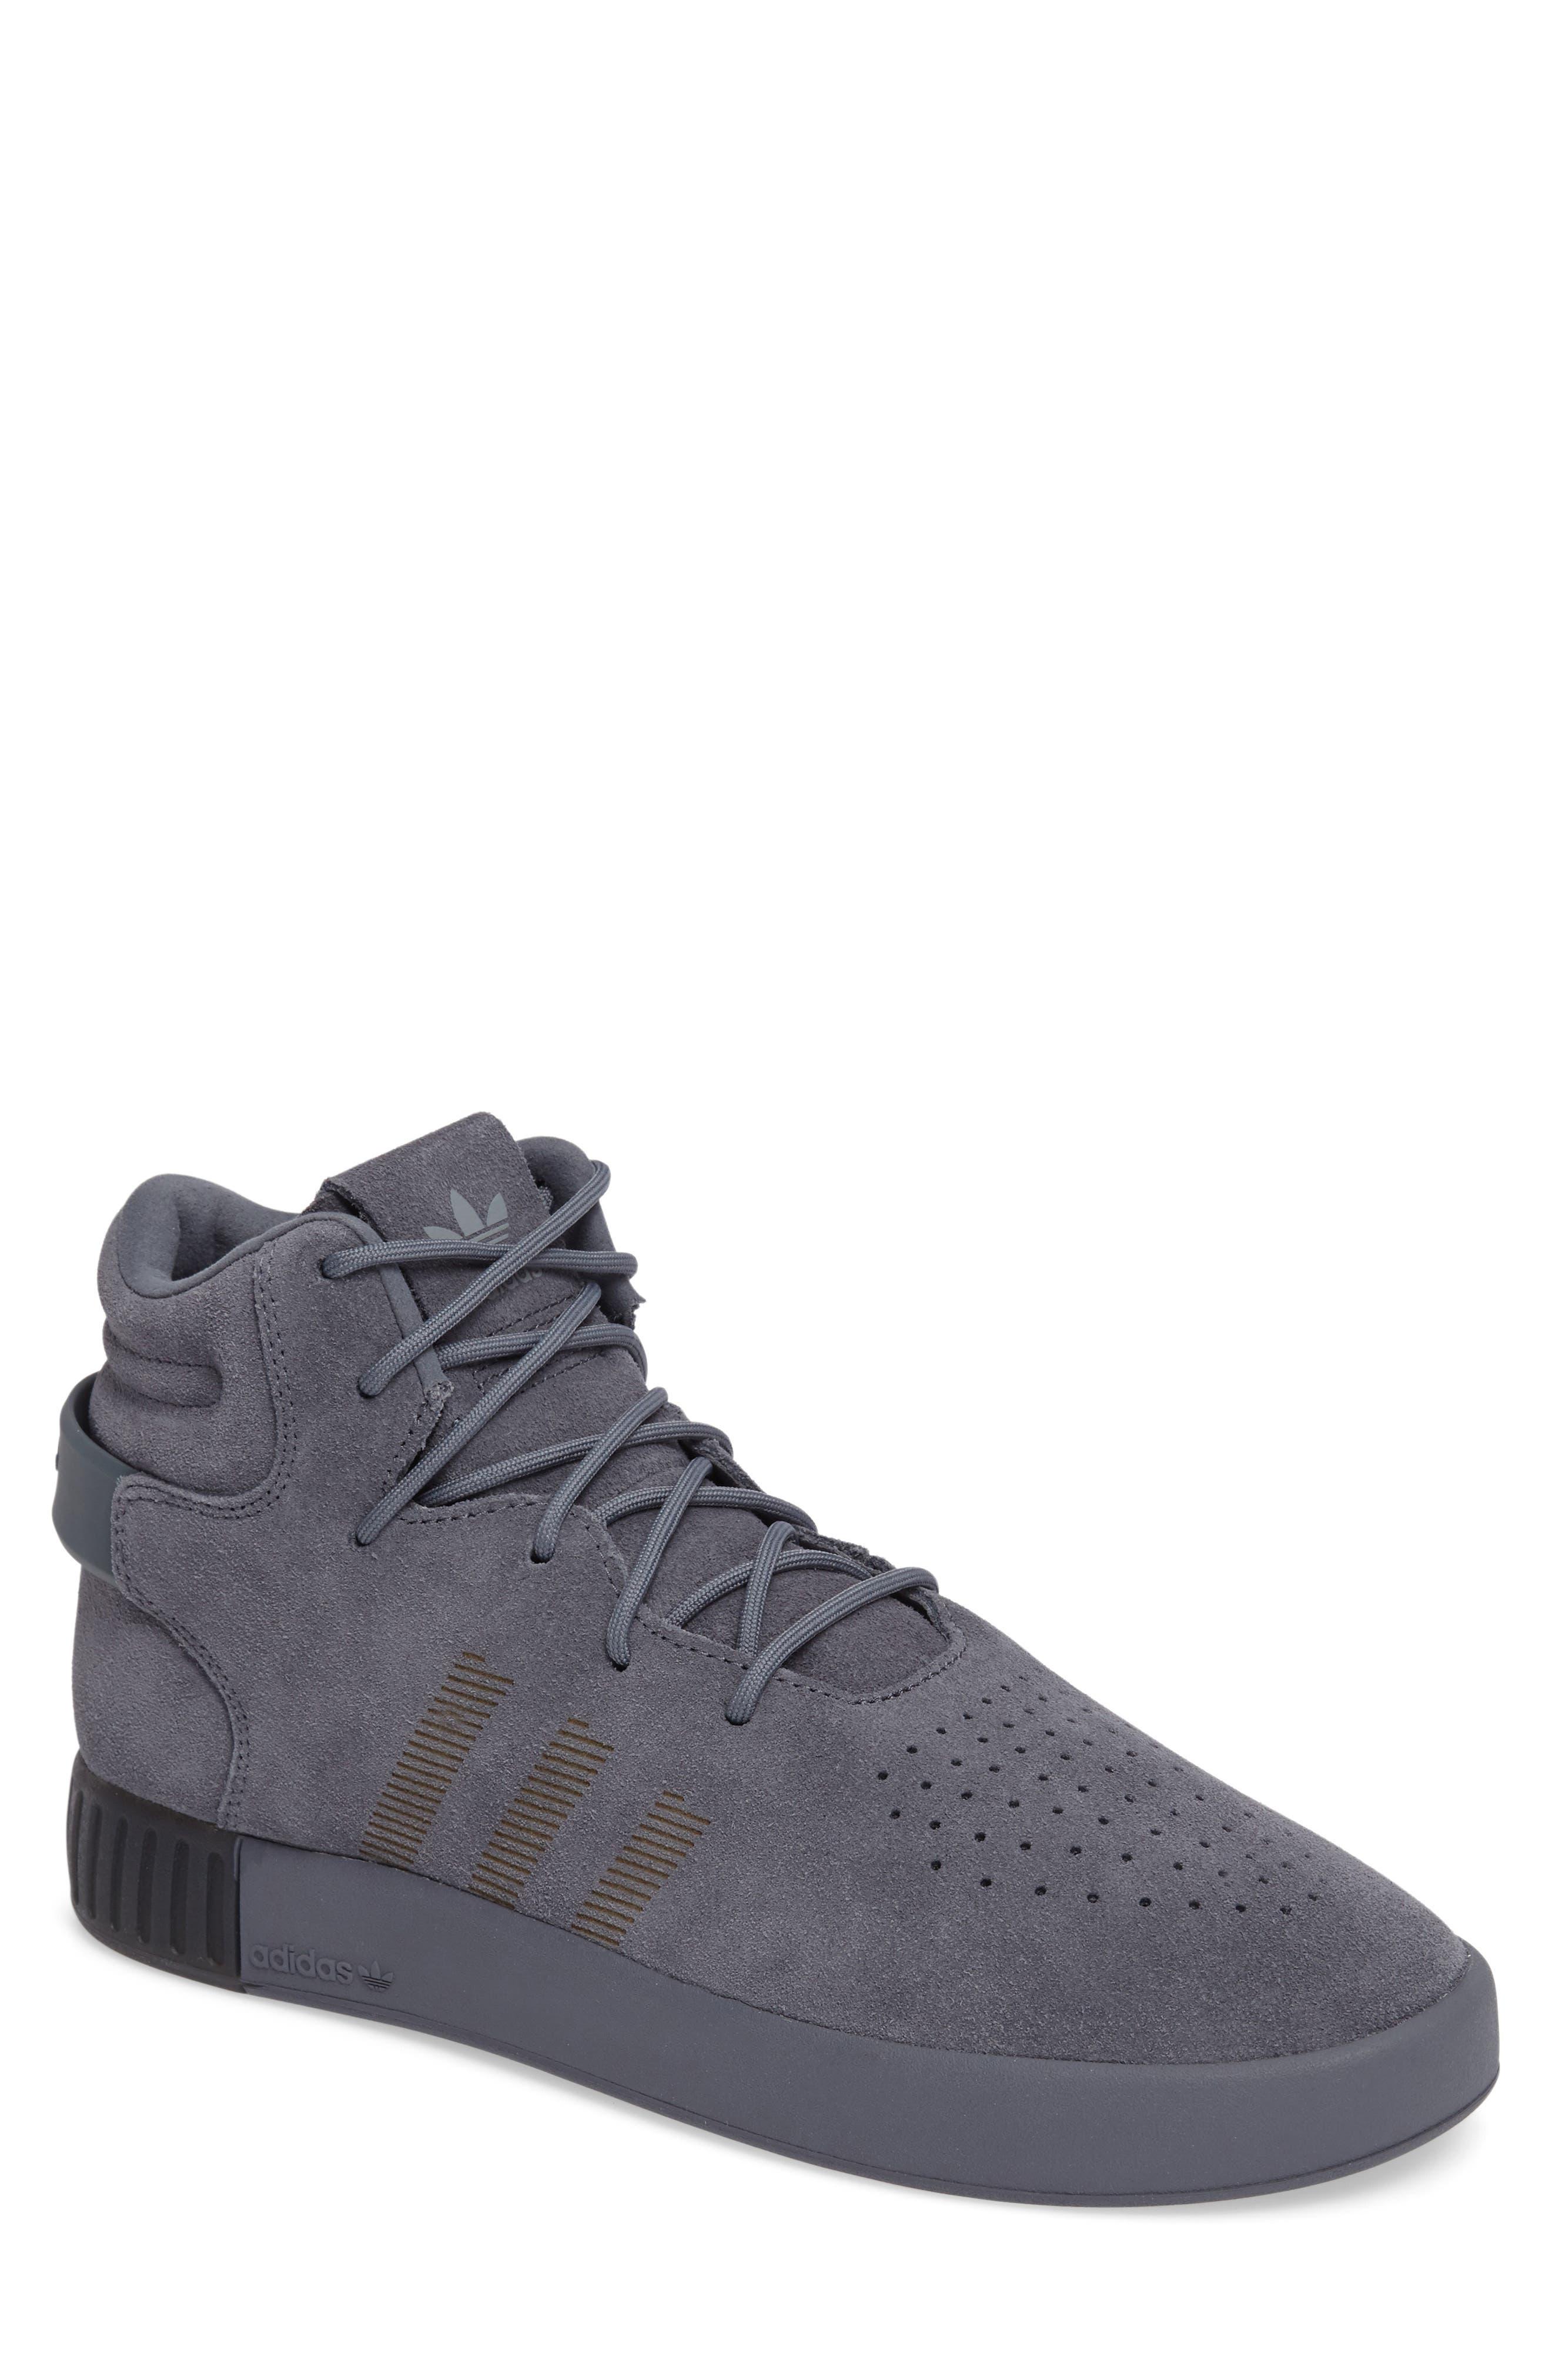 adidas Tubular Invader Mid Top Sneaker